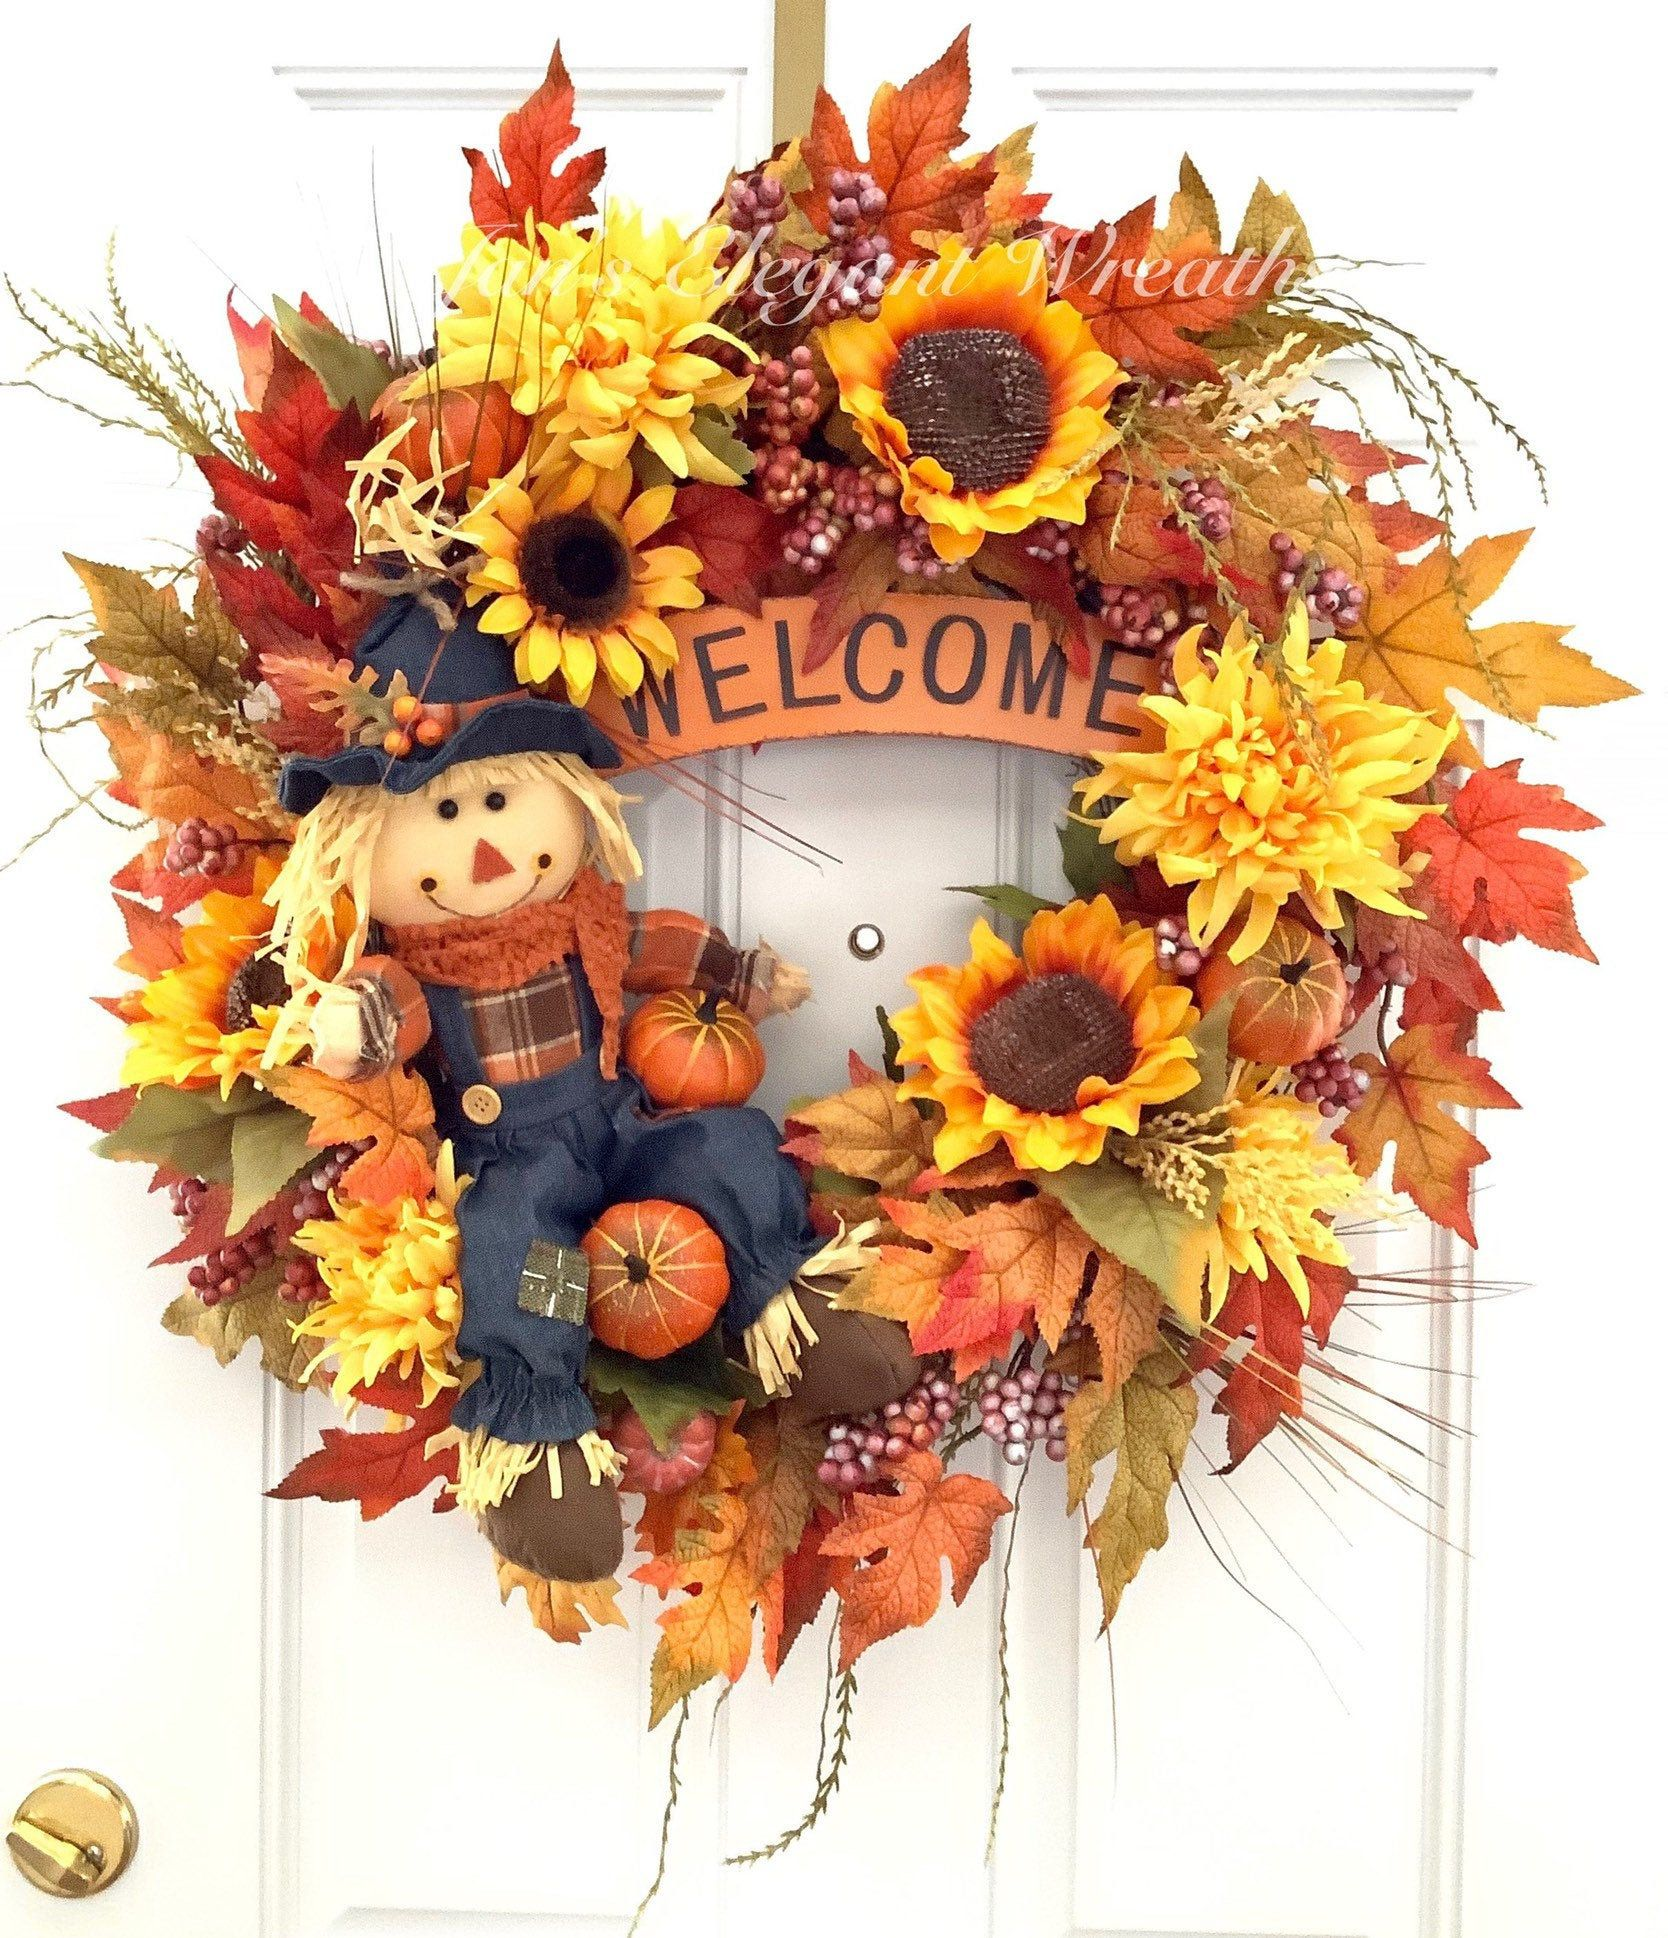 Fall Wreath. Welcome Wreath. Large Fall Wreath. Scarecrow Wreath. Sunflower Wreath for Fall.